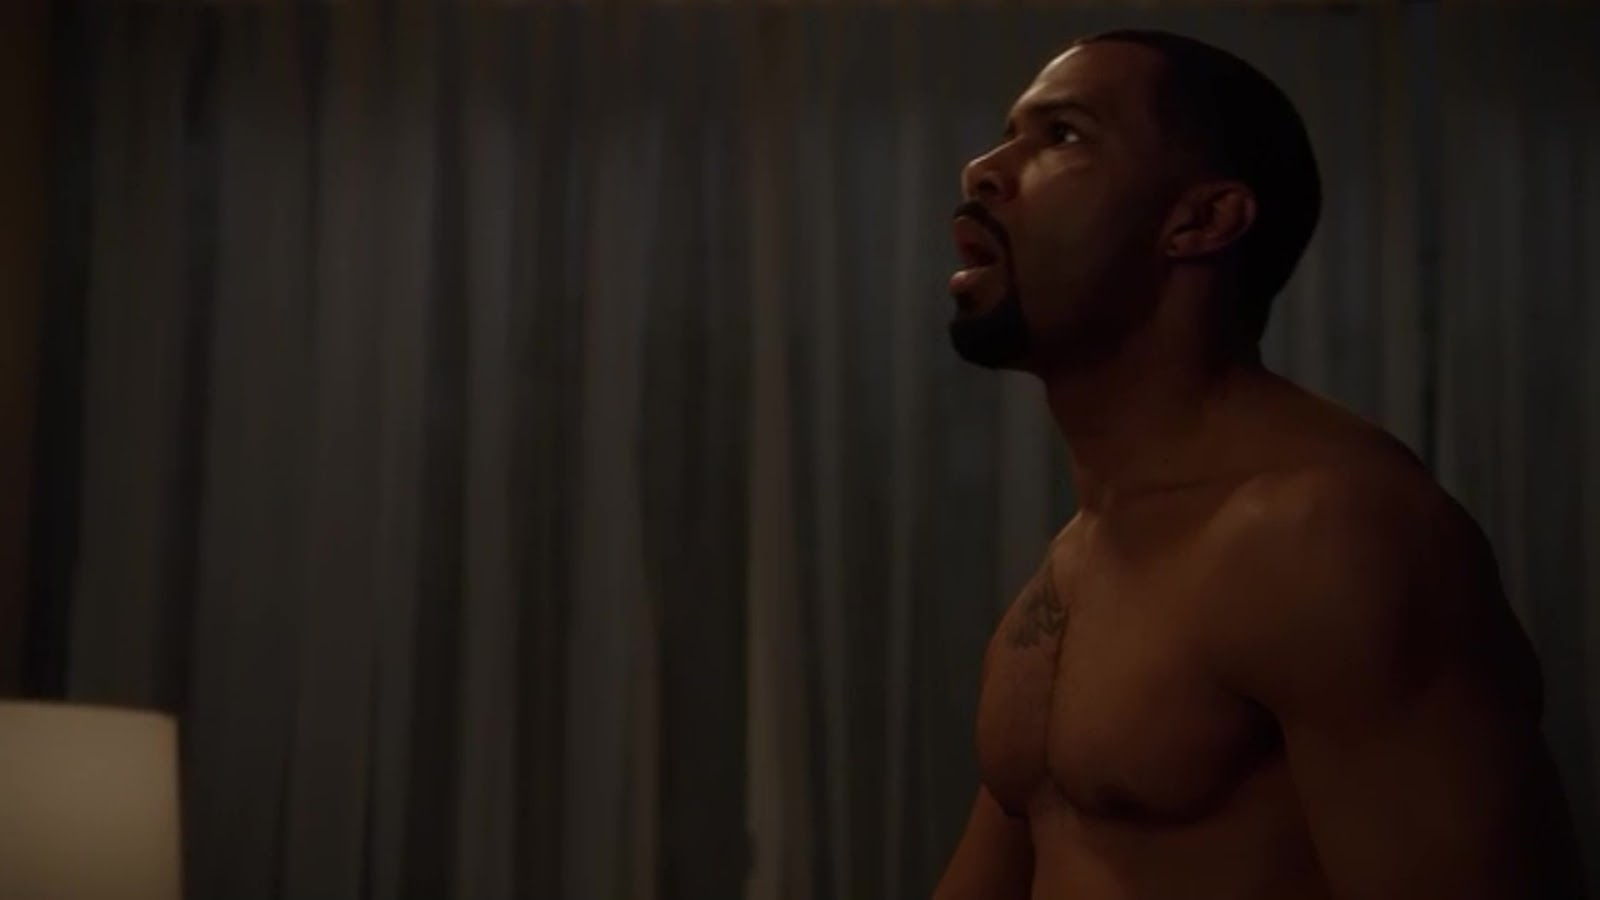 Auscaps Omari Hardwick Nude In Power 1-02 -3997